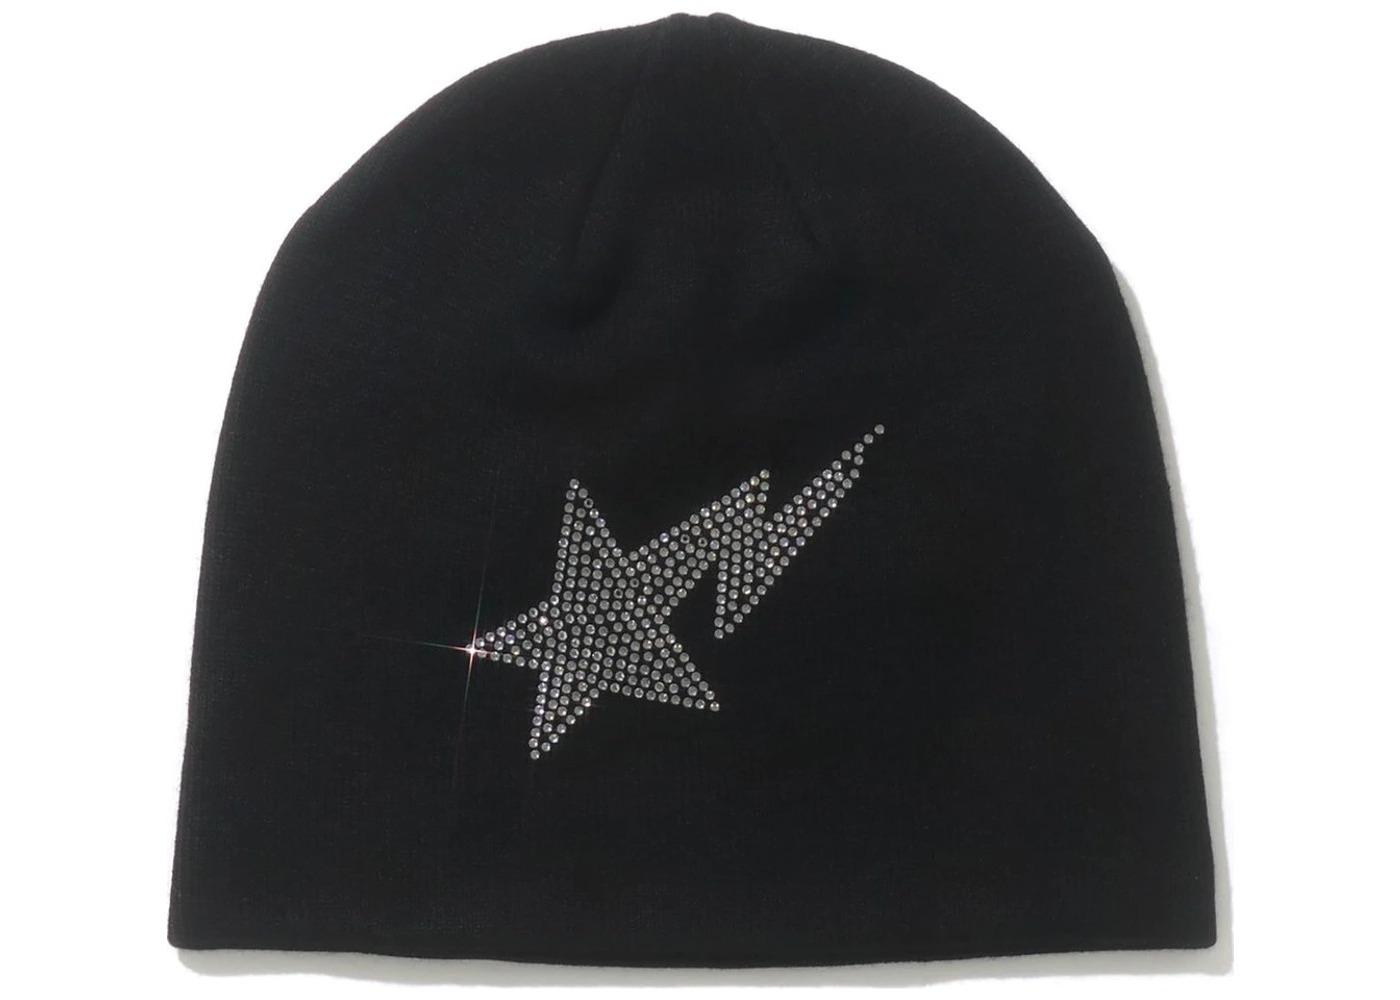 Bape STA Crystal Stone Knit Cap Black (SS21)の写真